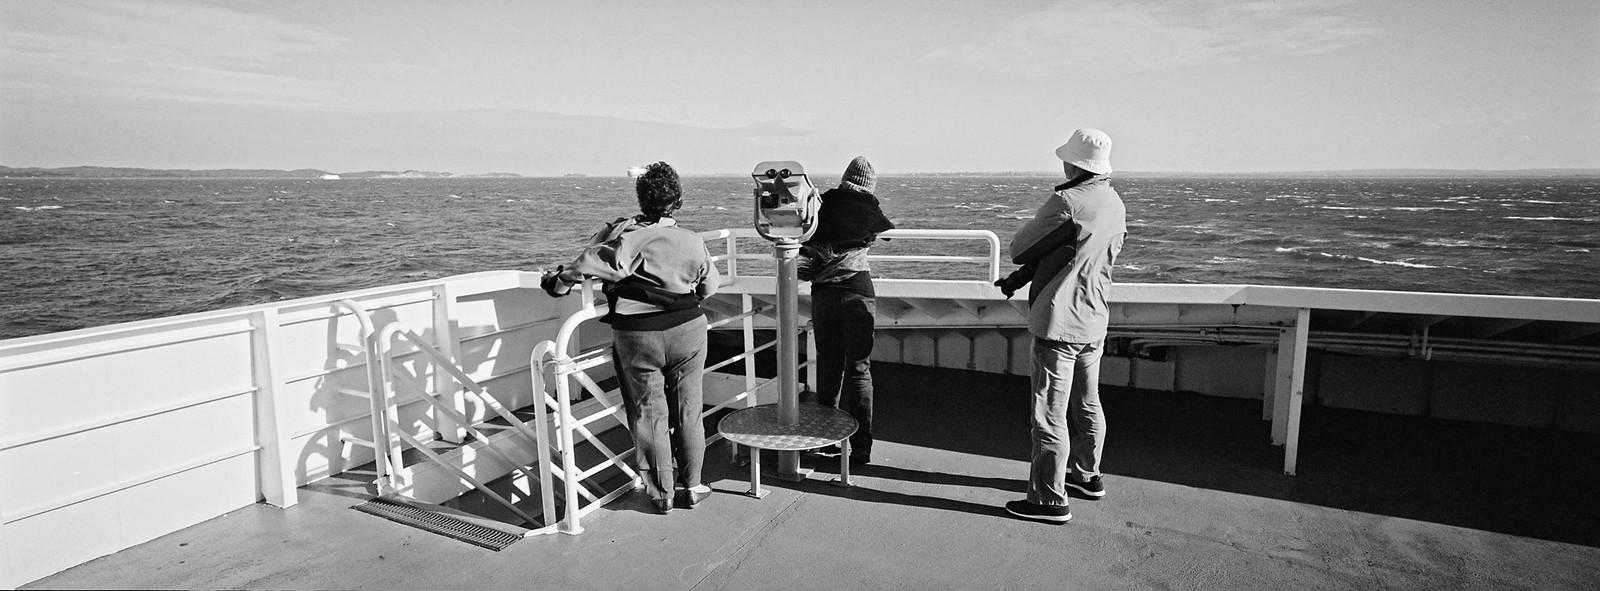 Binoculars iv